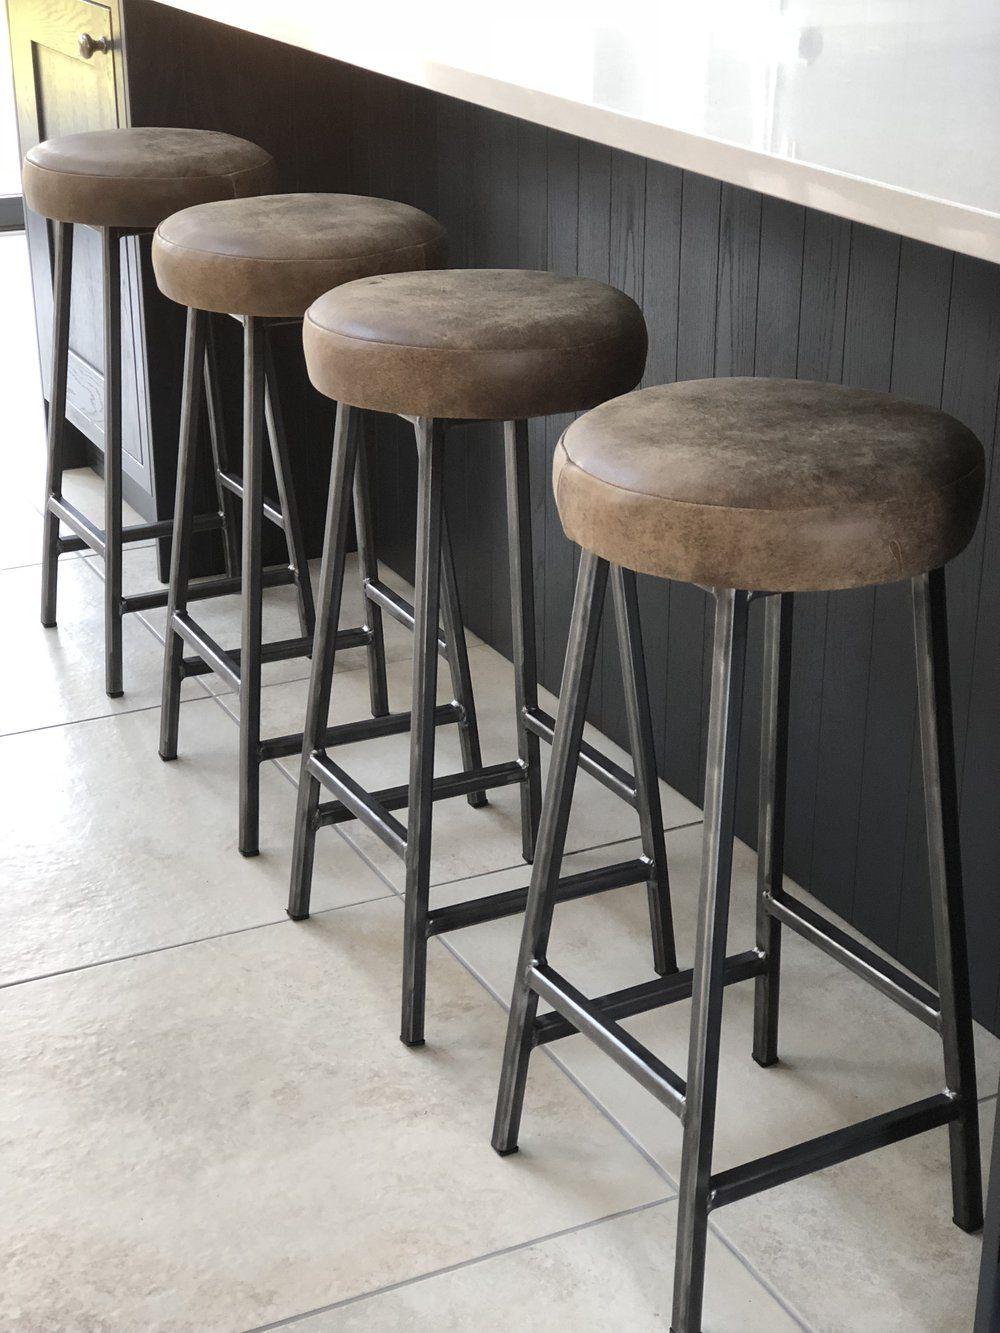 Leather Seat Bar Stool Paul Frampton Design Ltd Industrial Bar